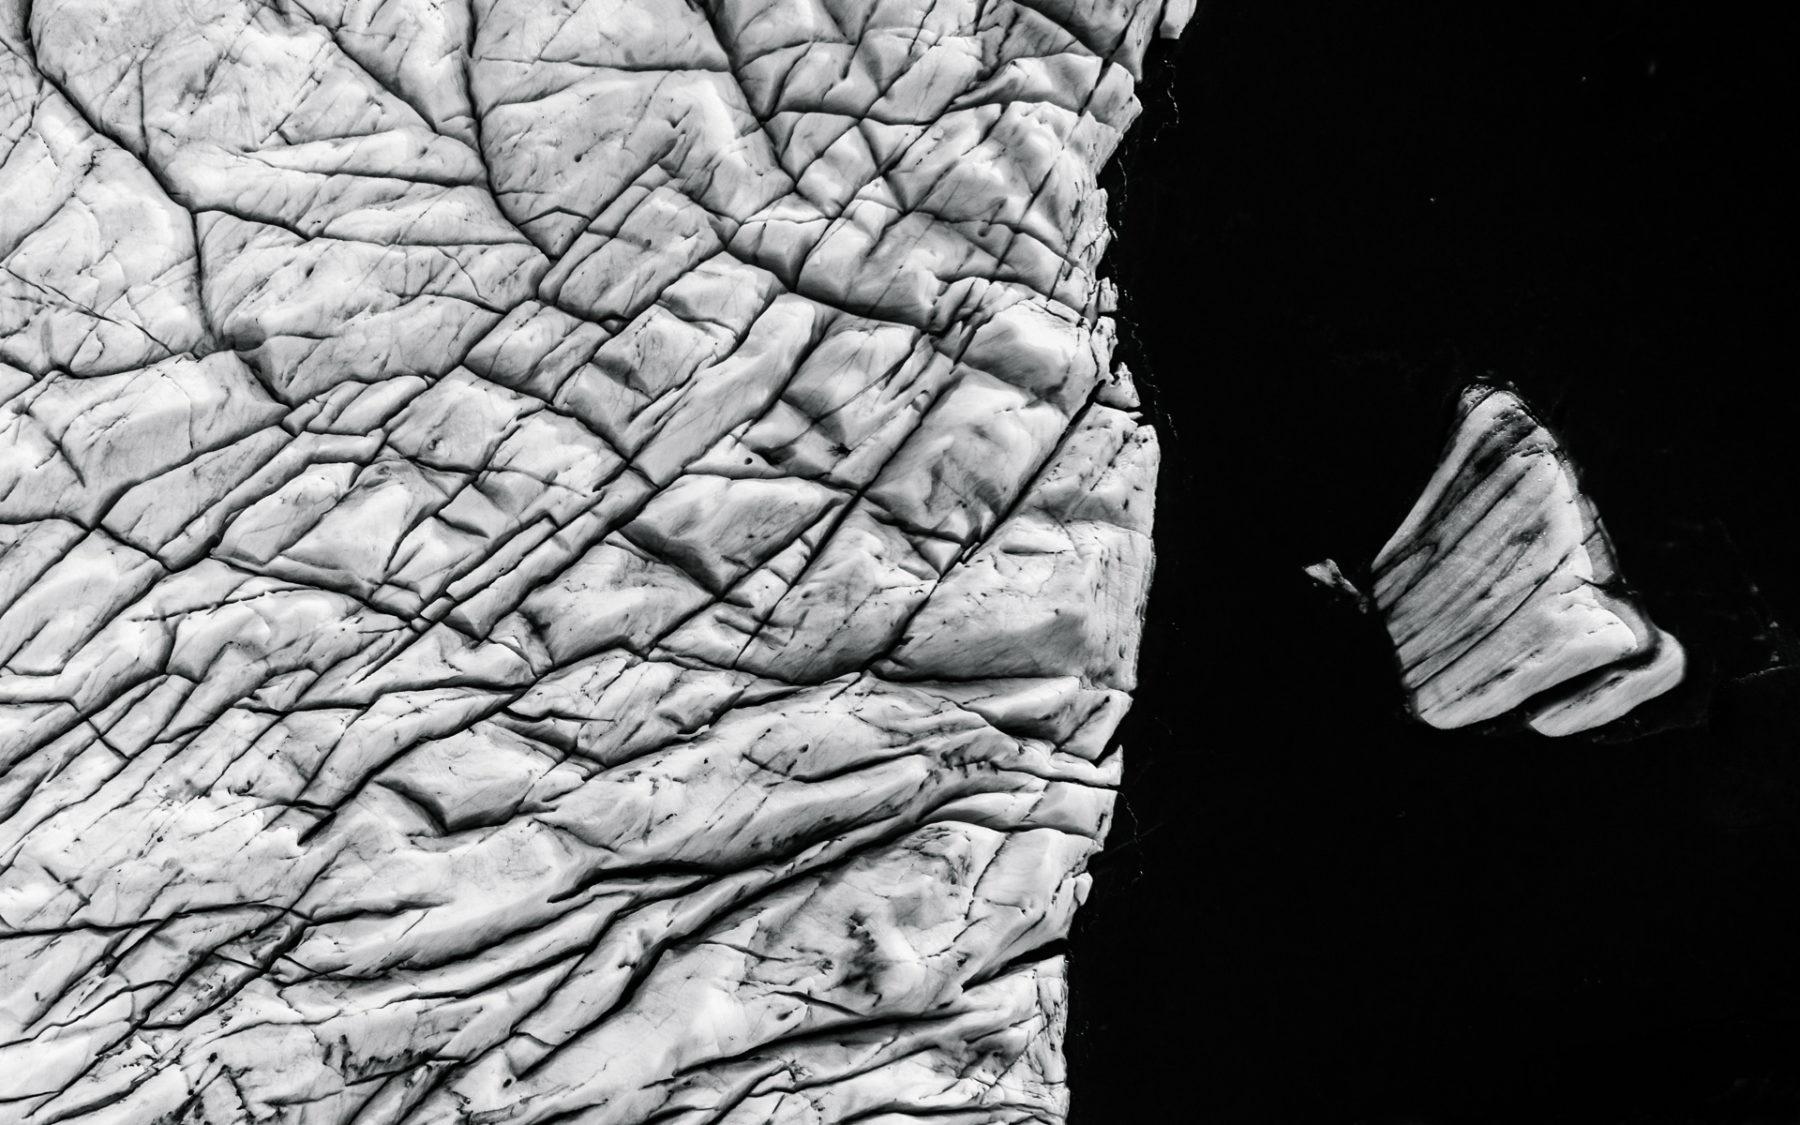 nls 2001 norway iceland portraits of glaciers 15